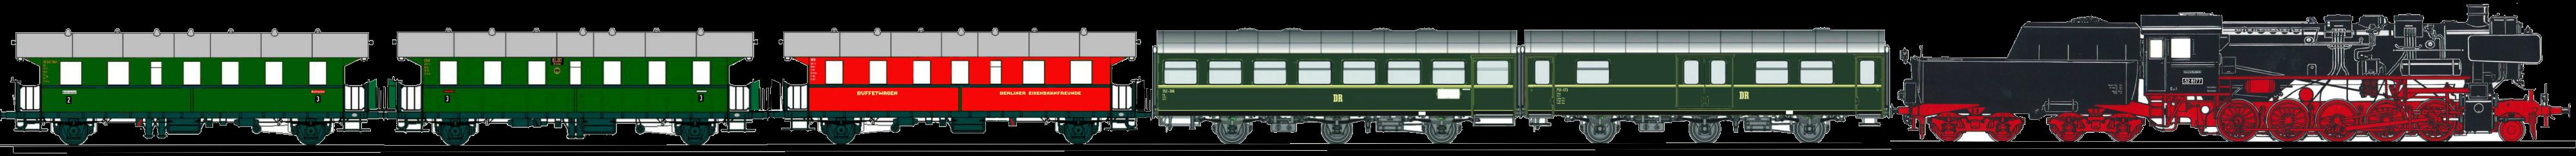 Zugsymbol BEF-Museumszug mit Dampflok